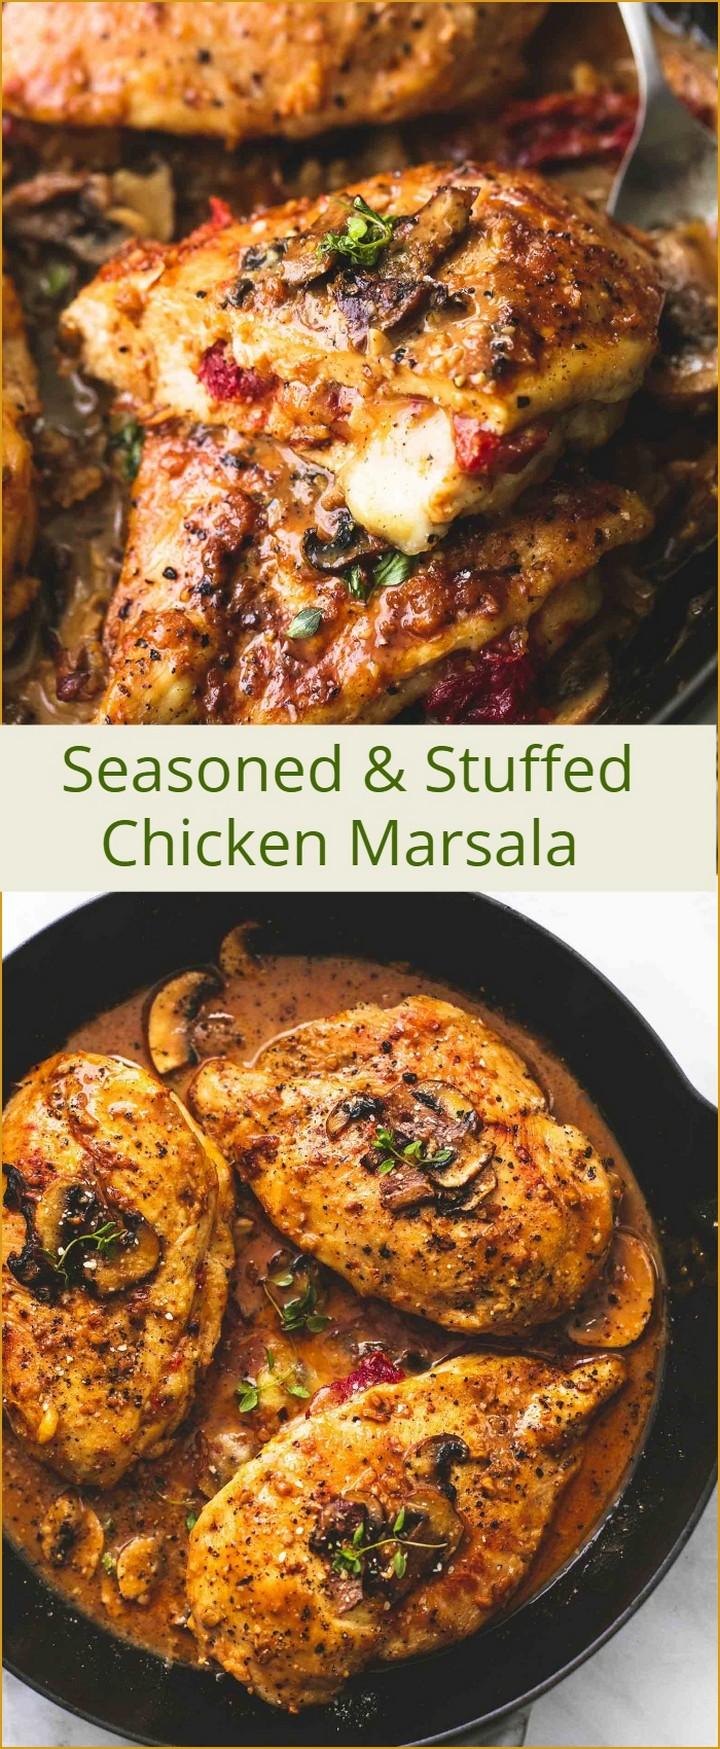 Seasoned and Stuffed Chicken Marsala 1 1